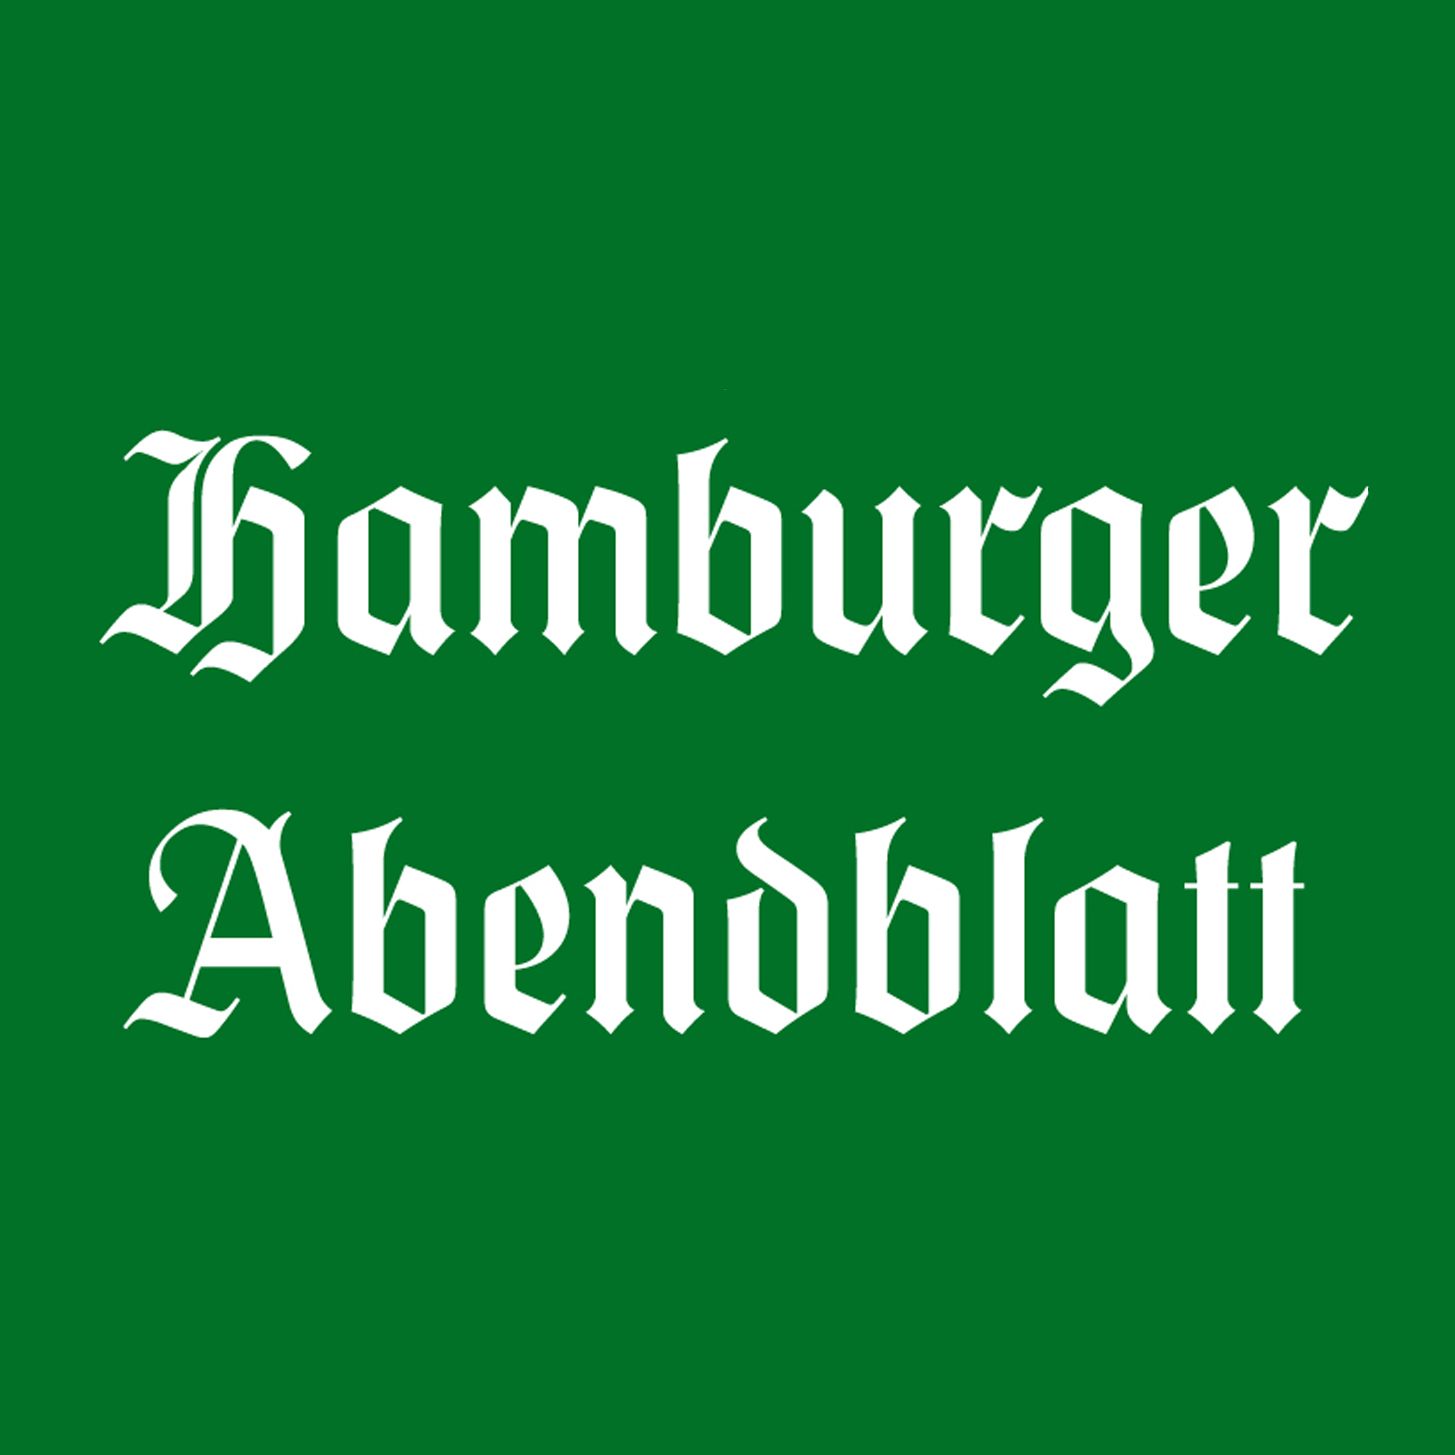 hamburger_abendblatt